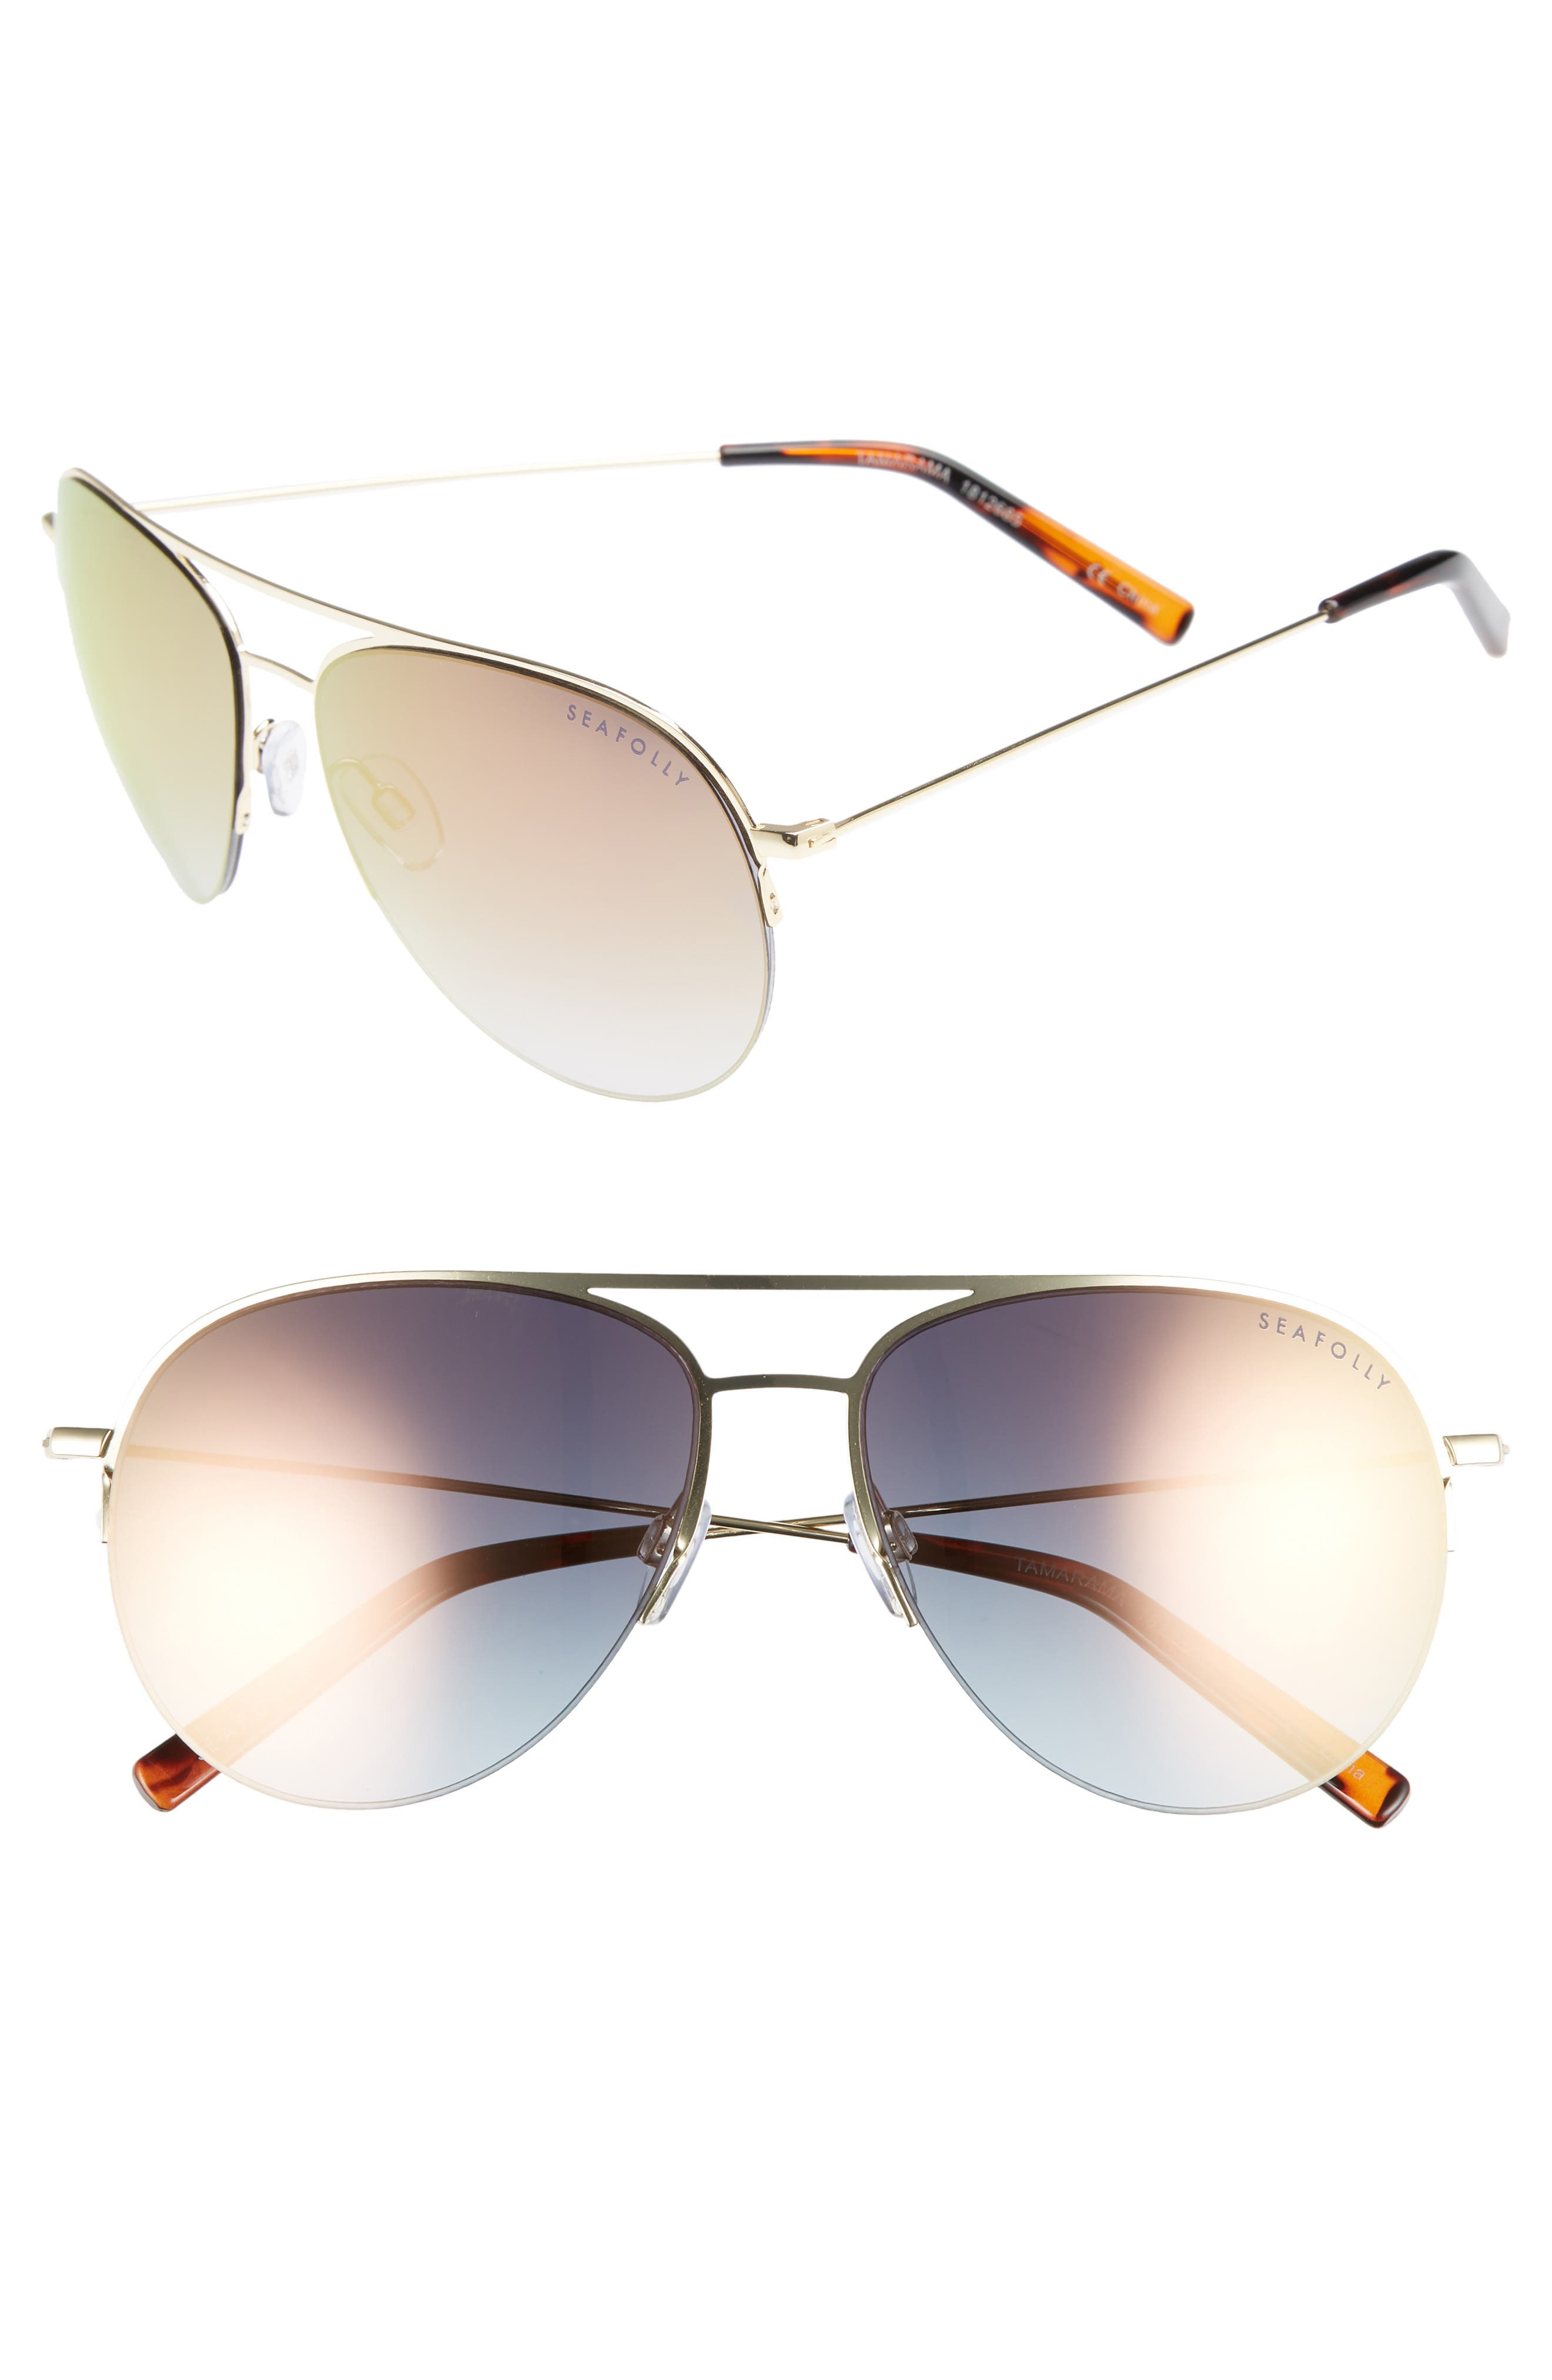 Tamarama 60mm Aviator Sunglasses,                             Main thumbnail 1, color,                             Gold